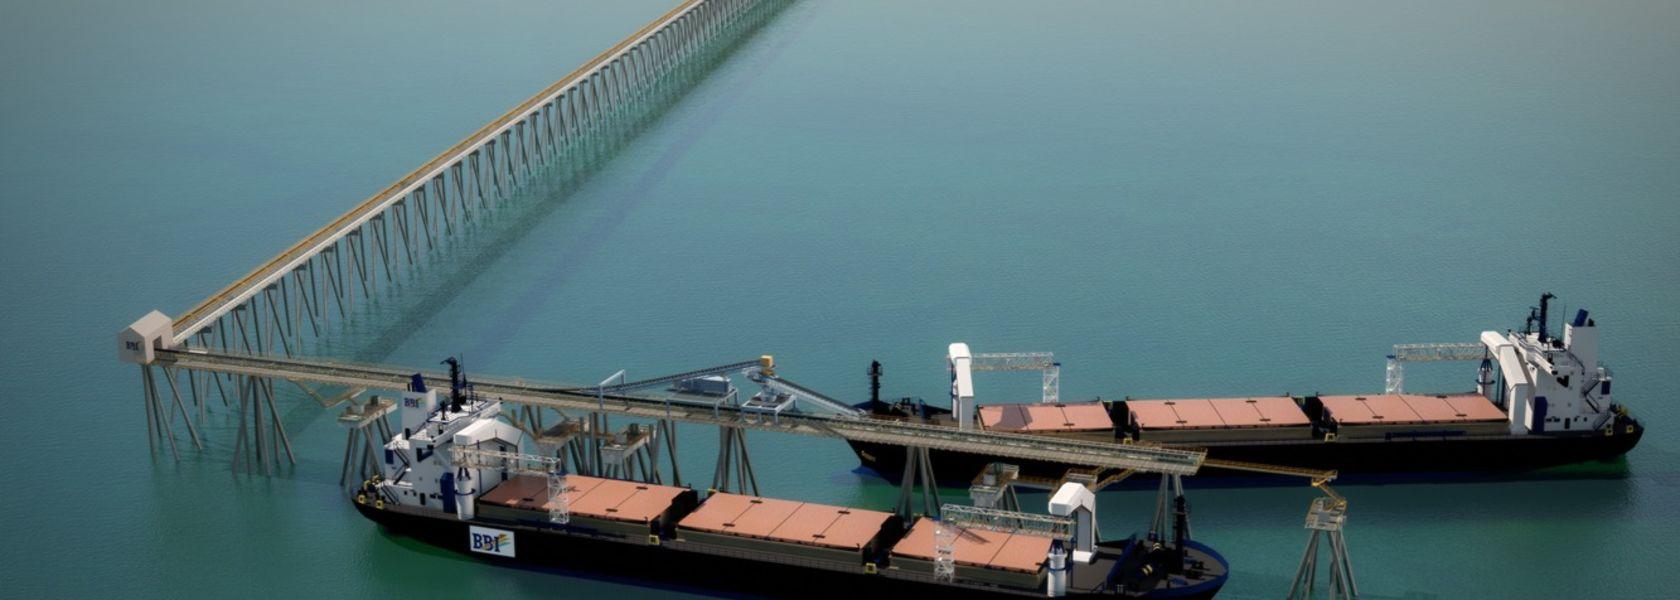 Engineering contract signed for Balla Balla - Mining Magazine